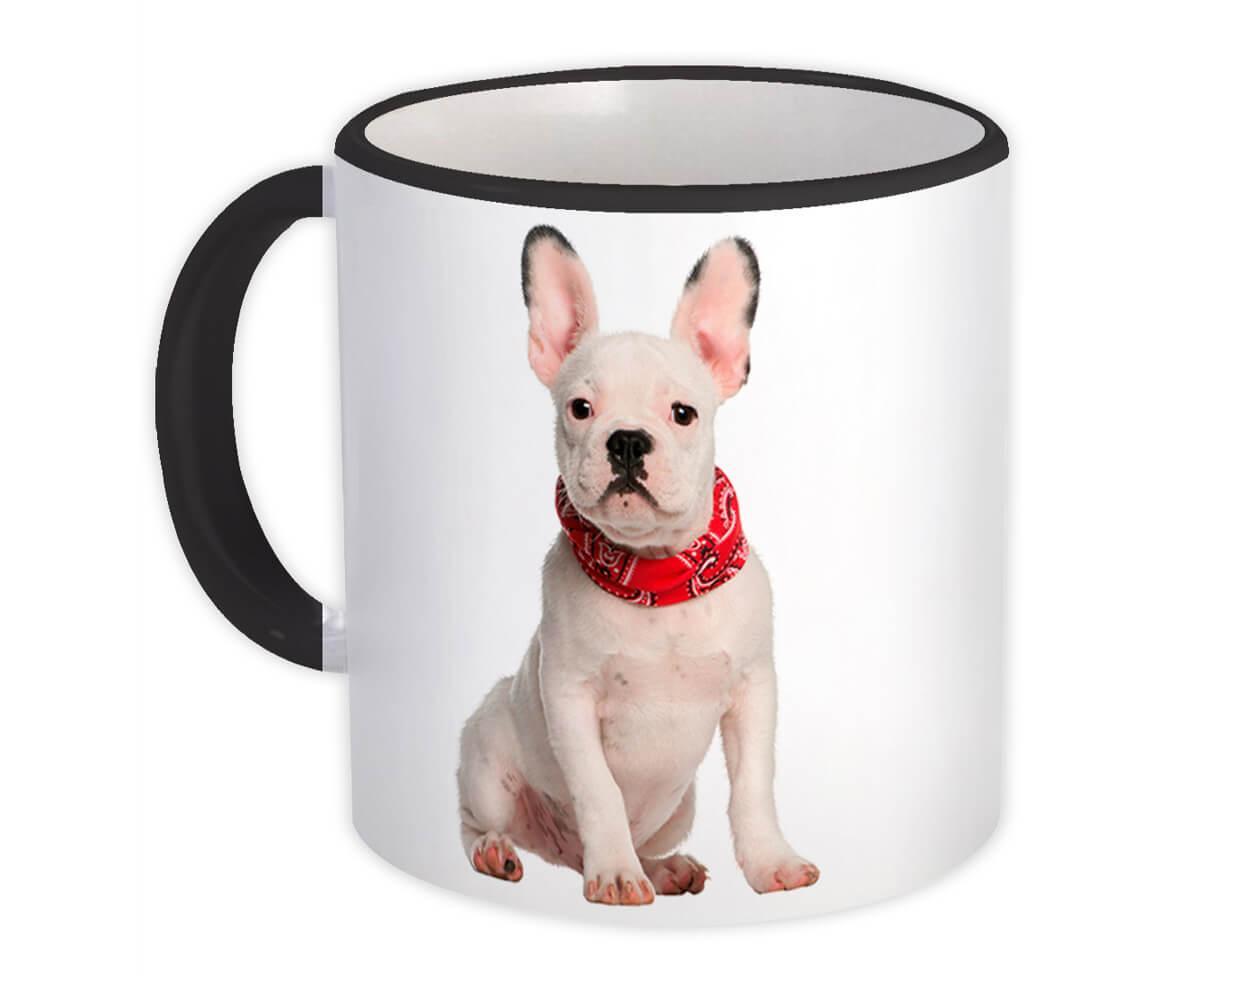 French Bulldog : Gift Mug Dog Animal Cute Funny Canine Puppy